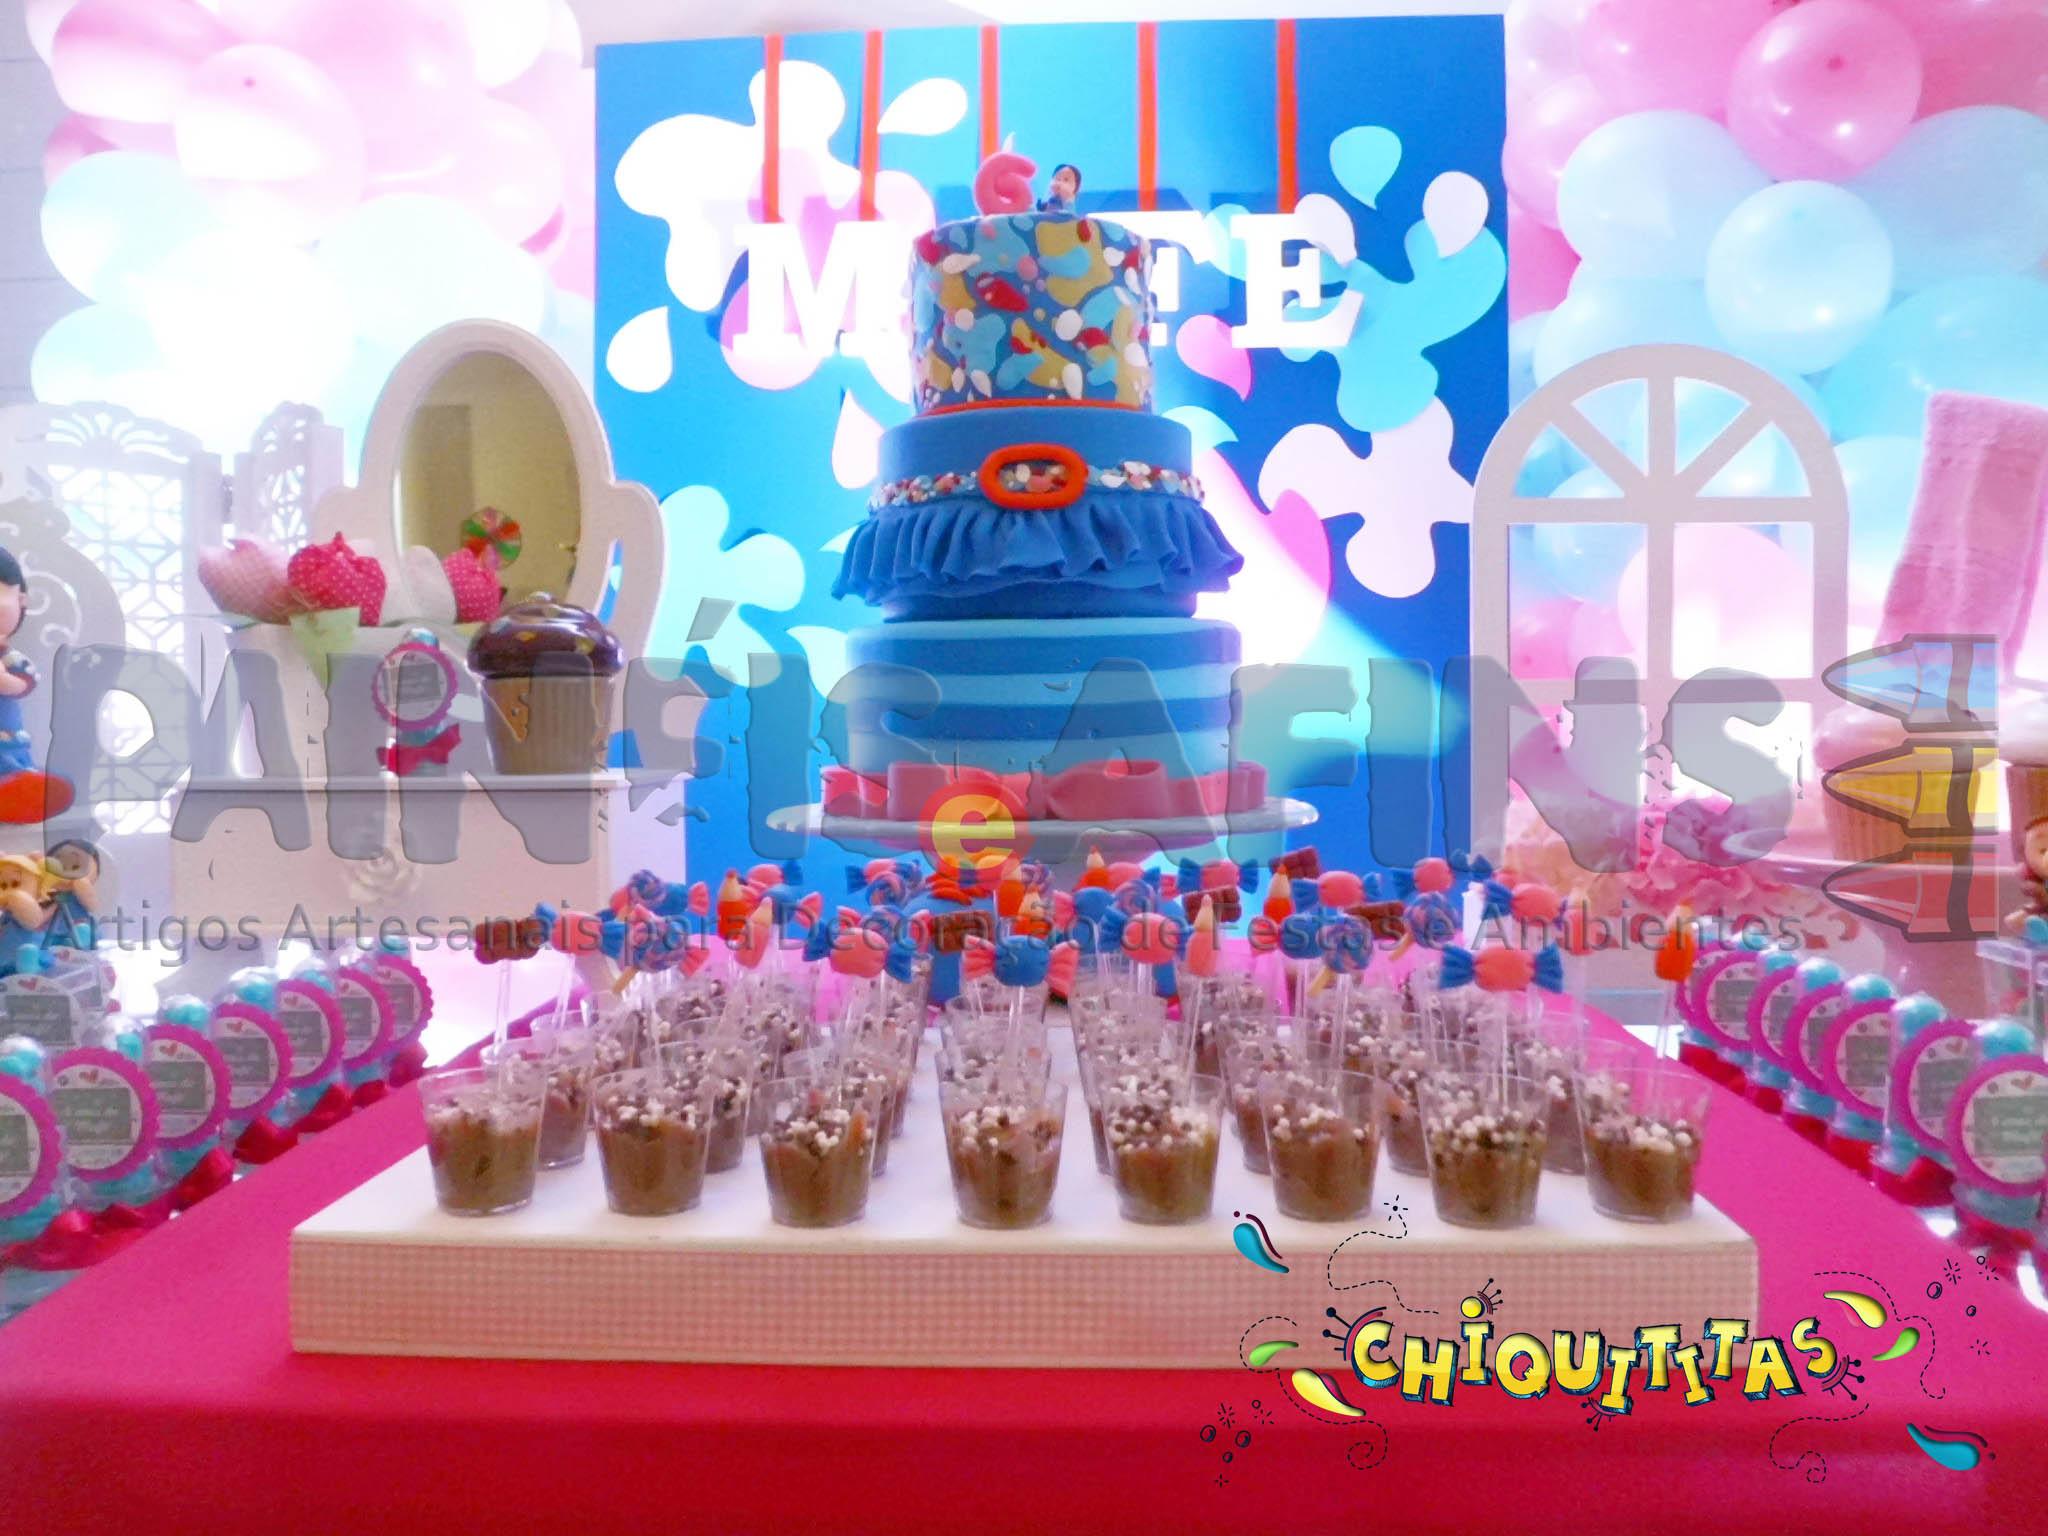 decora o festa infantil das chiquititas